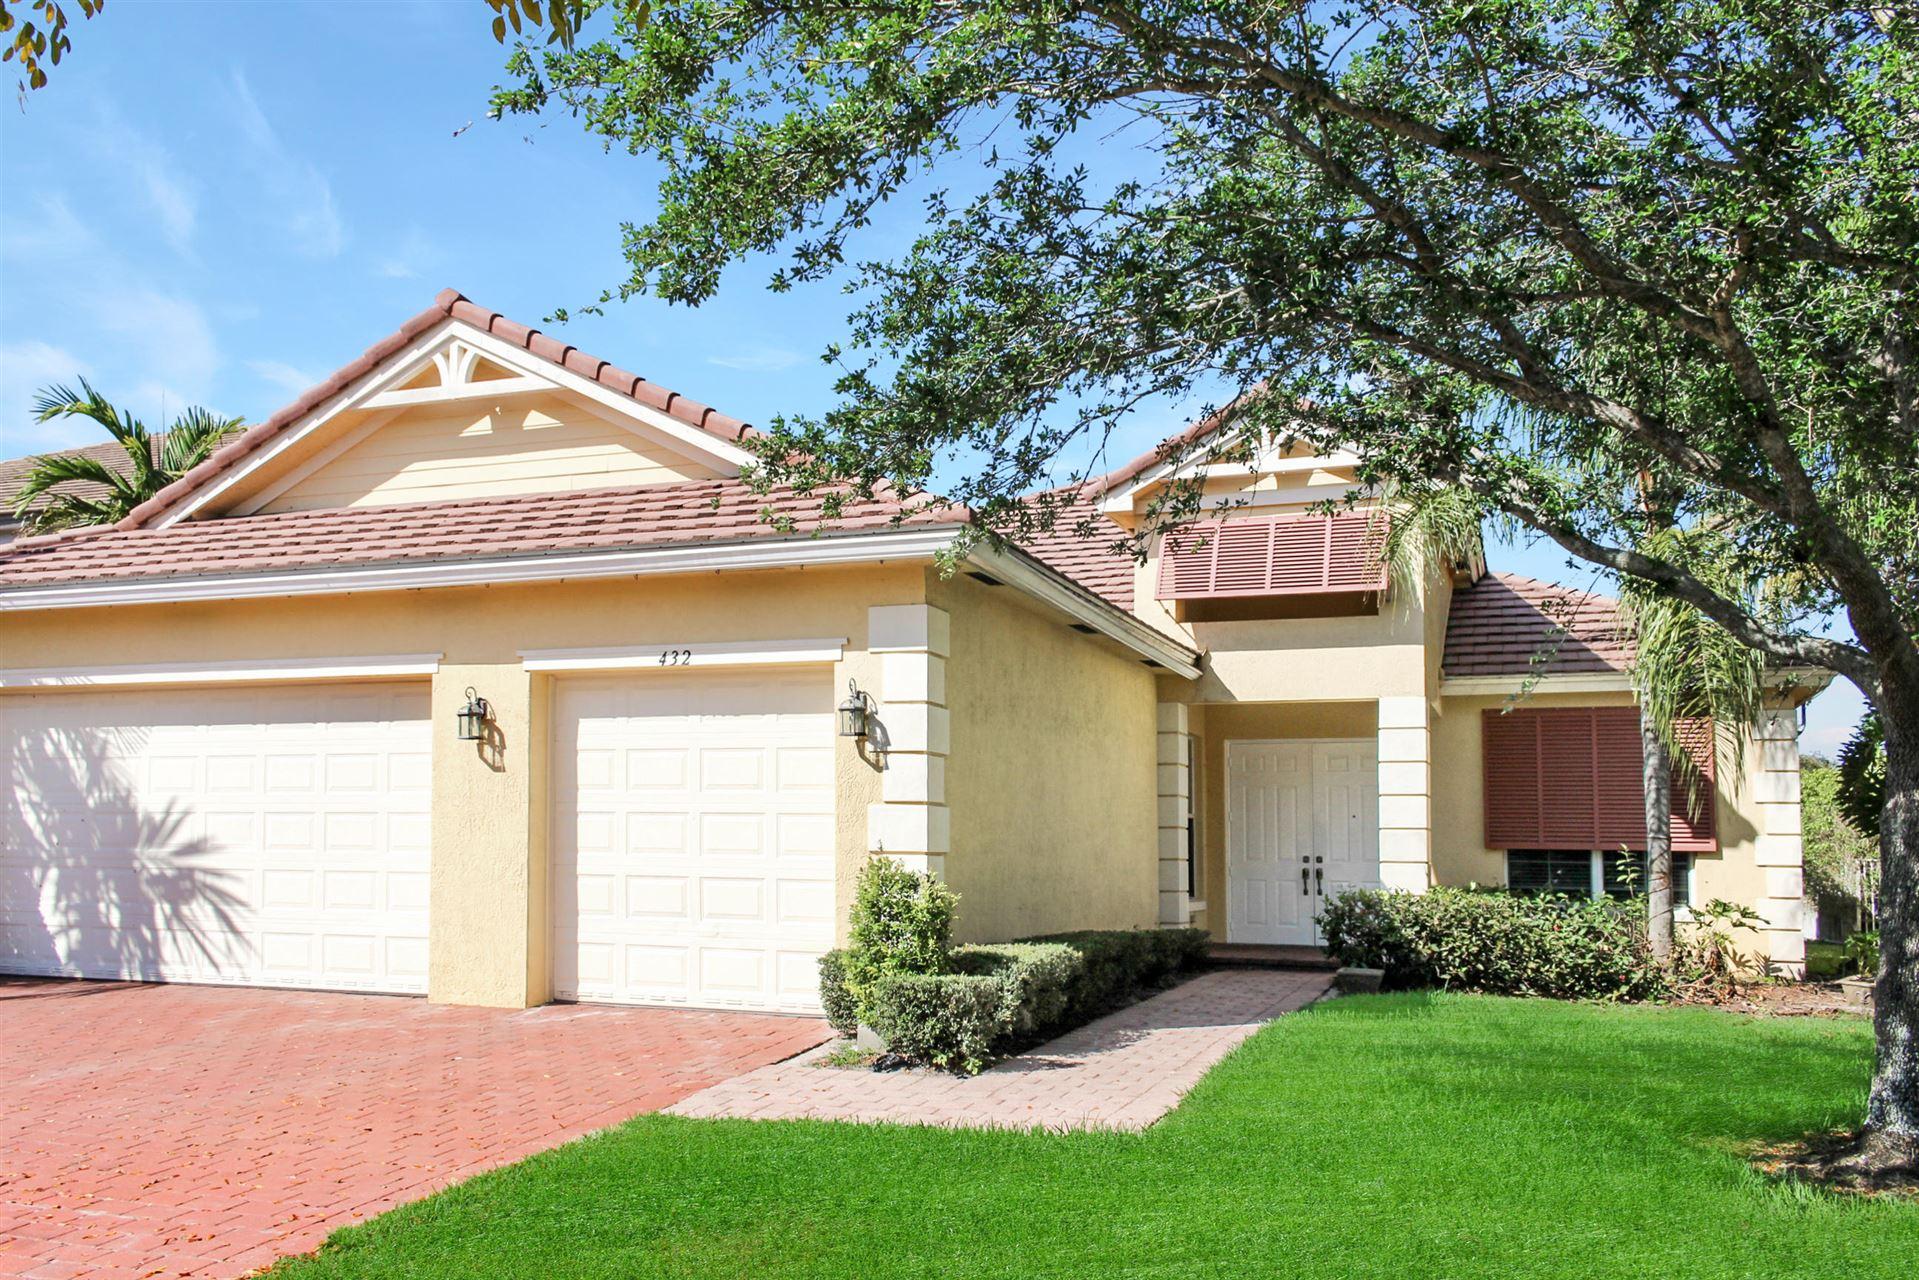 432 Saint Emma Drive, Royal Palm Beach, FL 33411 - #: RX-10613909